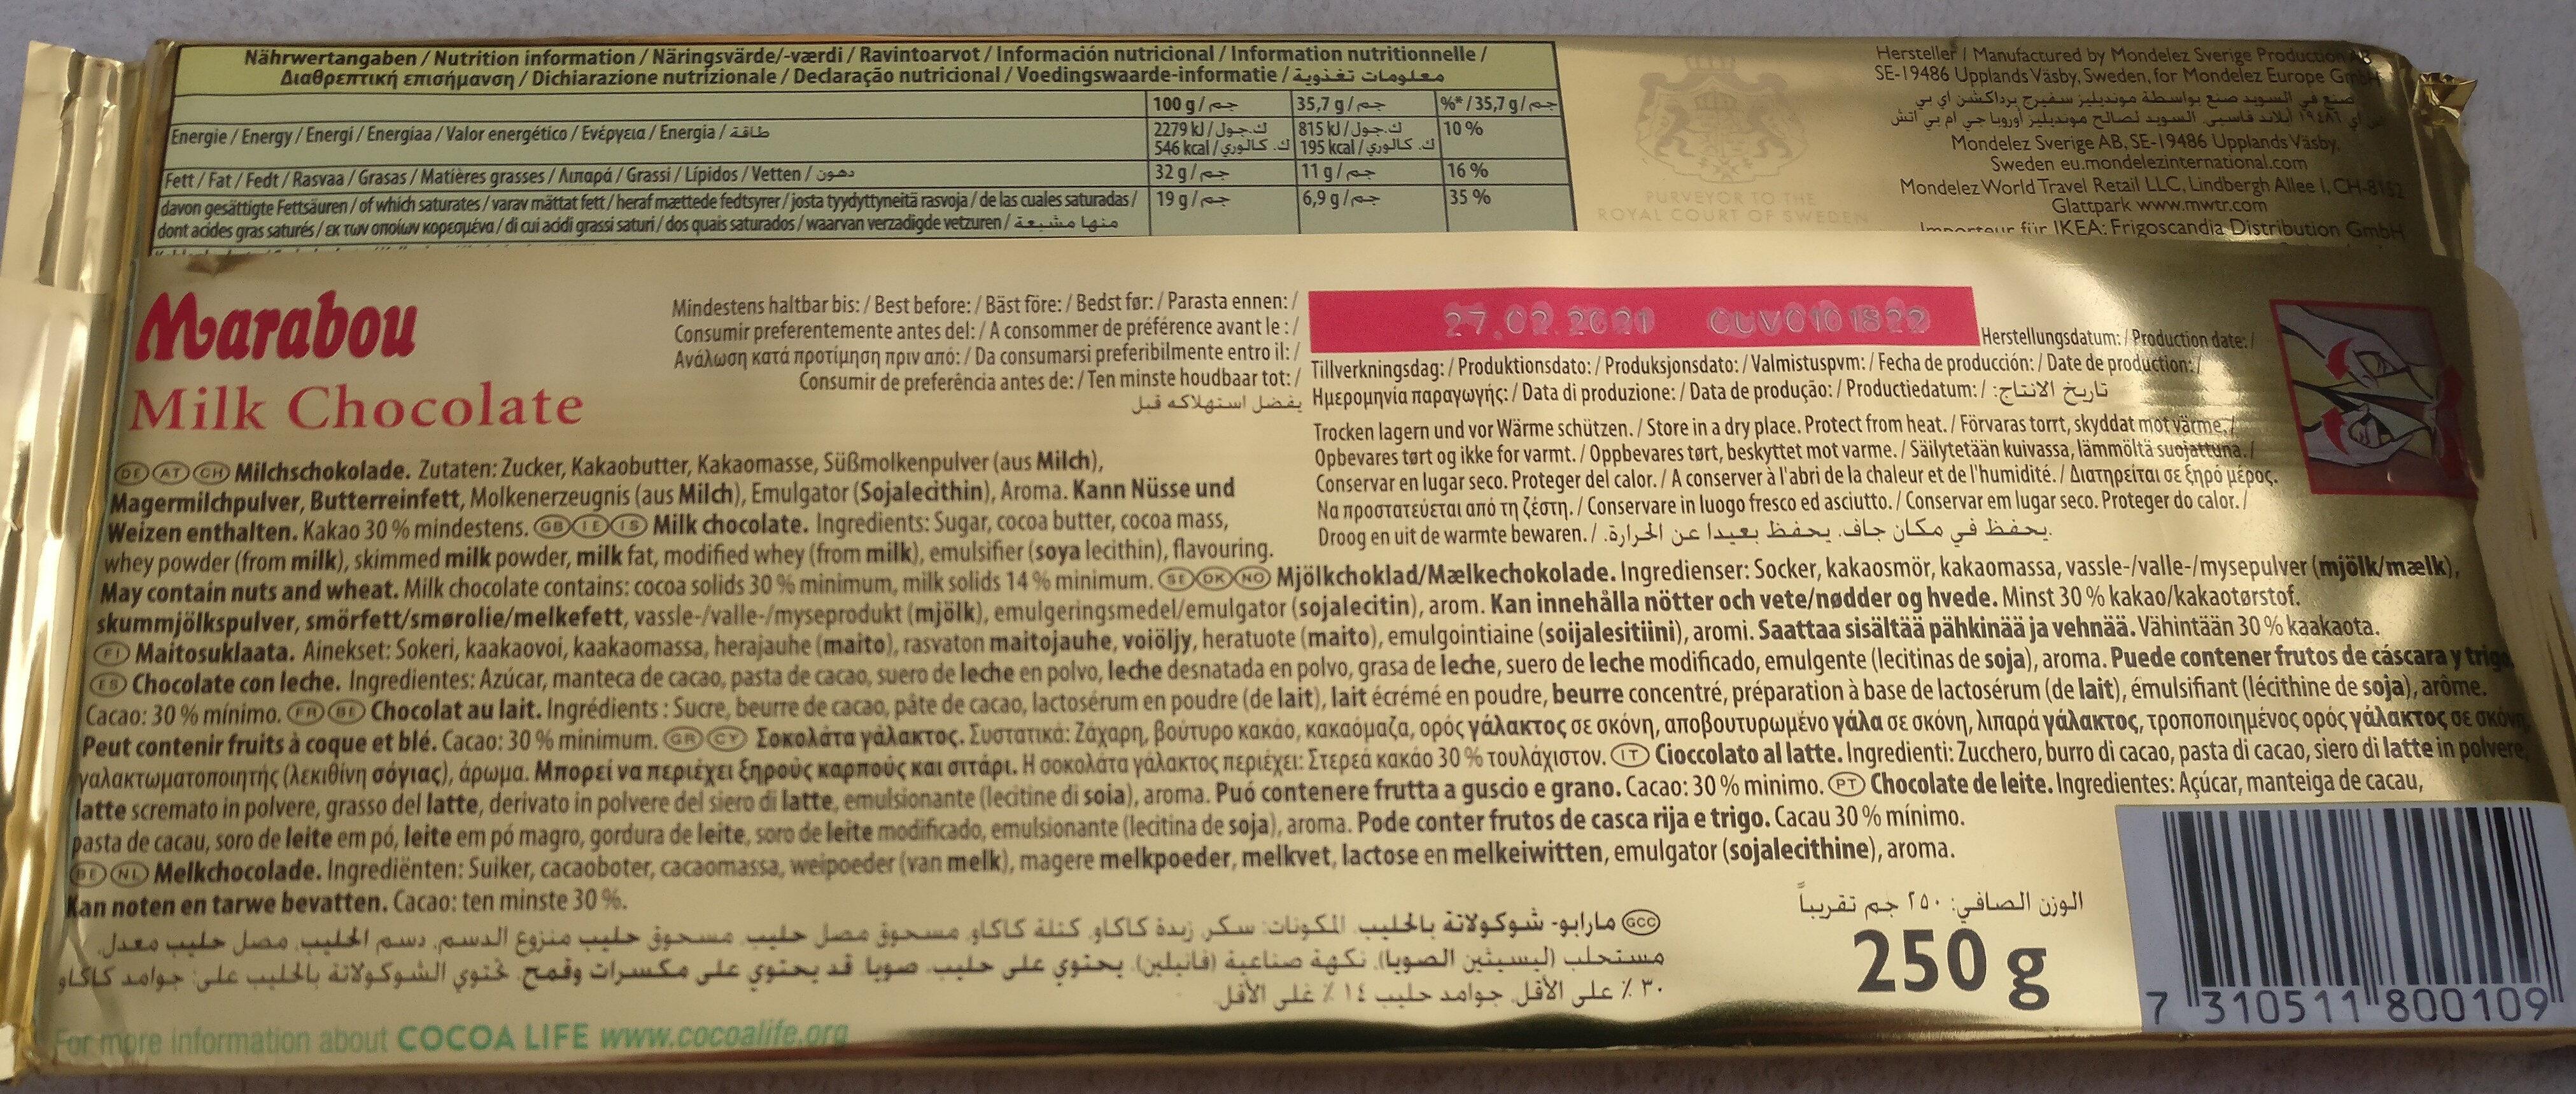 Marabou Mjölk chokolad - Ingredienser - de